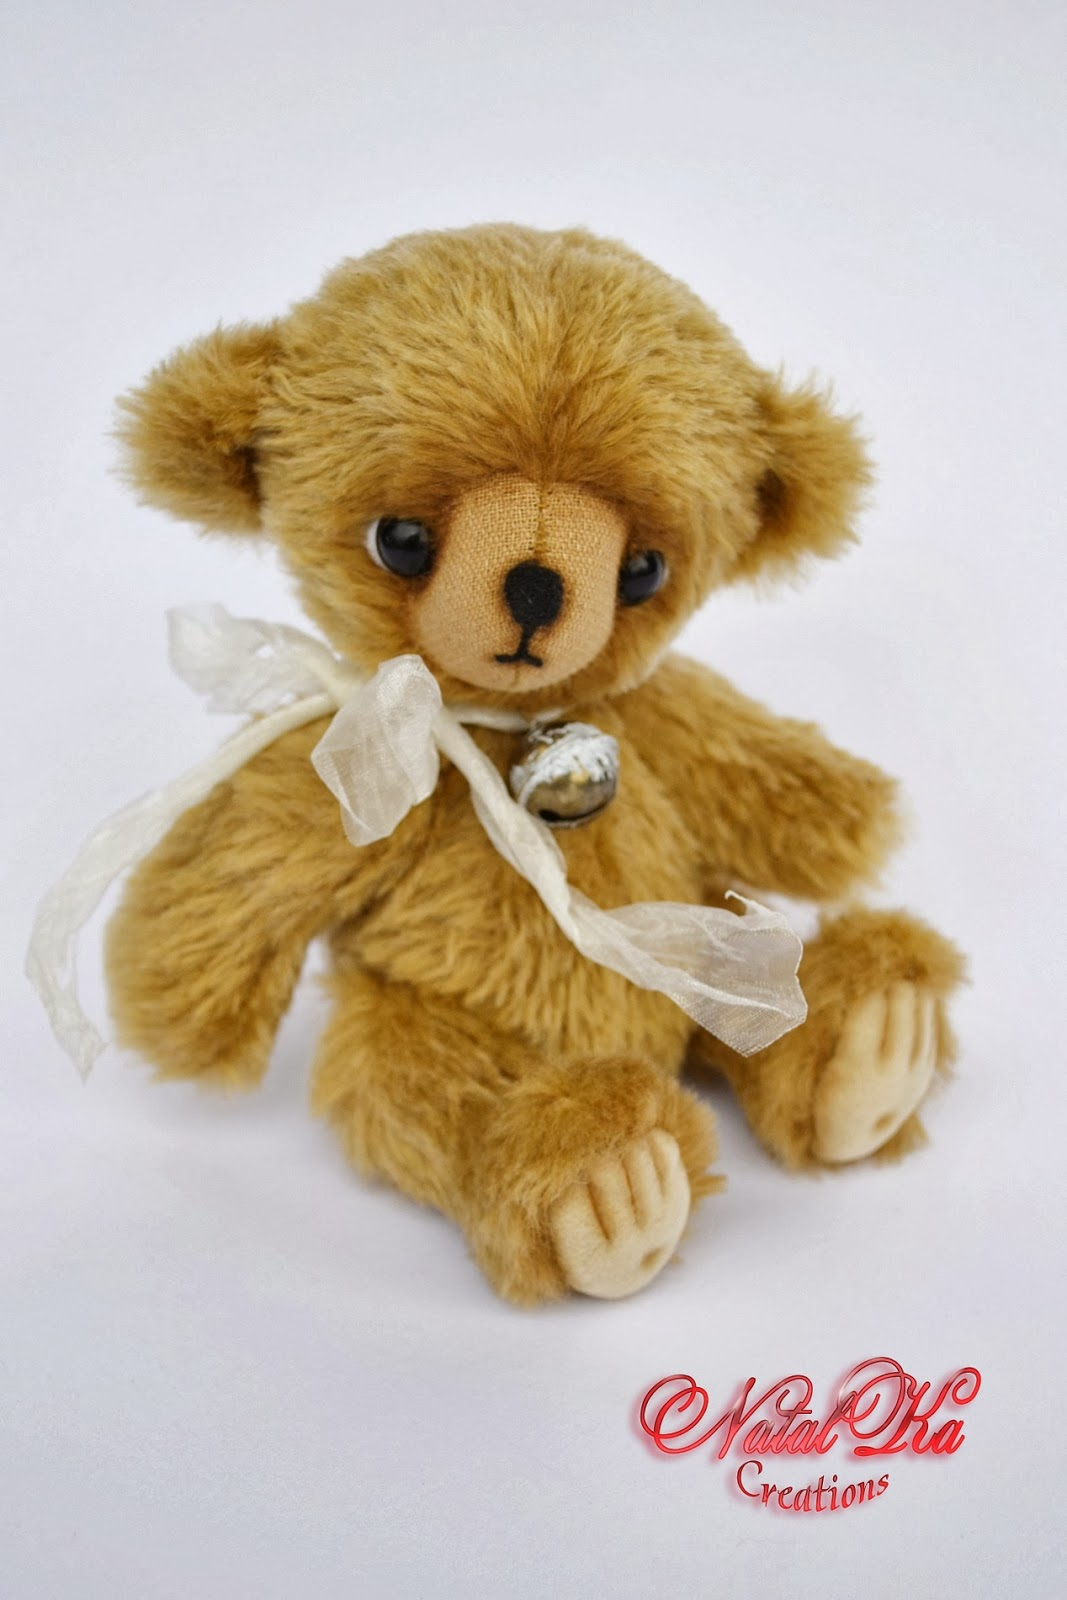 Künstler Teddybär handgemacht von NatalKa Creations. Artist teddy beat handmade by Natalka Creations.